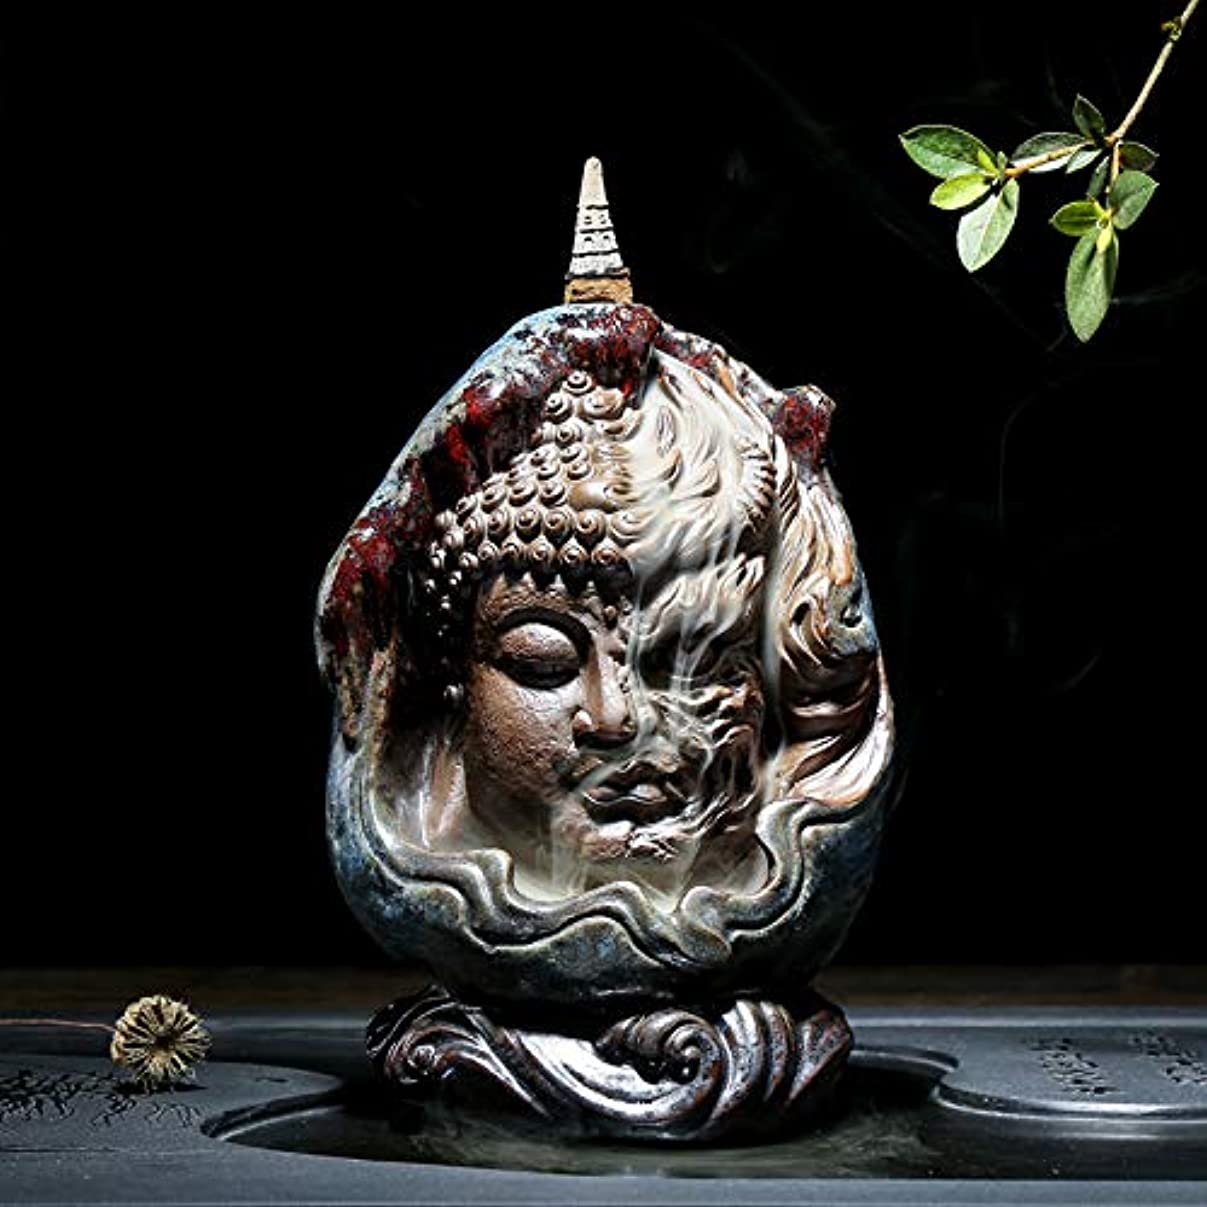 PHILOGOD 陶器仏壇用香炉 ユニークなスタイリング逆流香炉 お香 ホルダー紫砂香立て